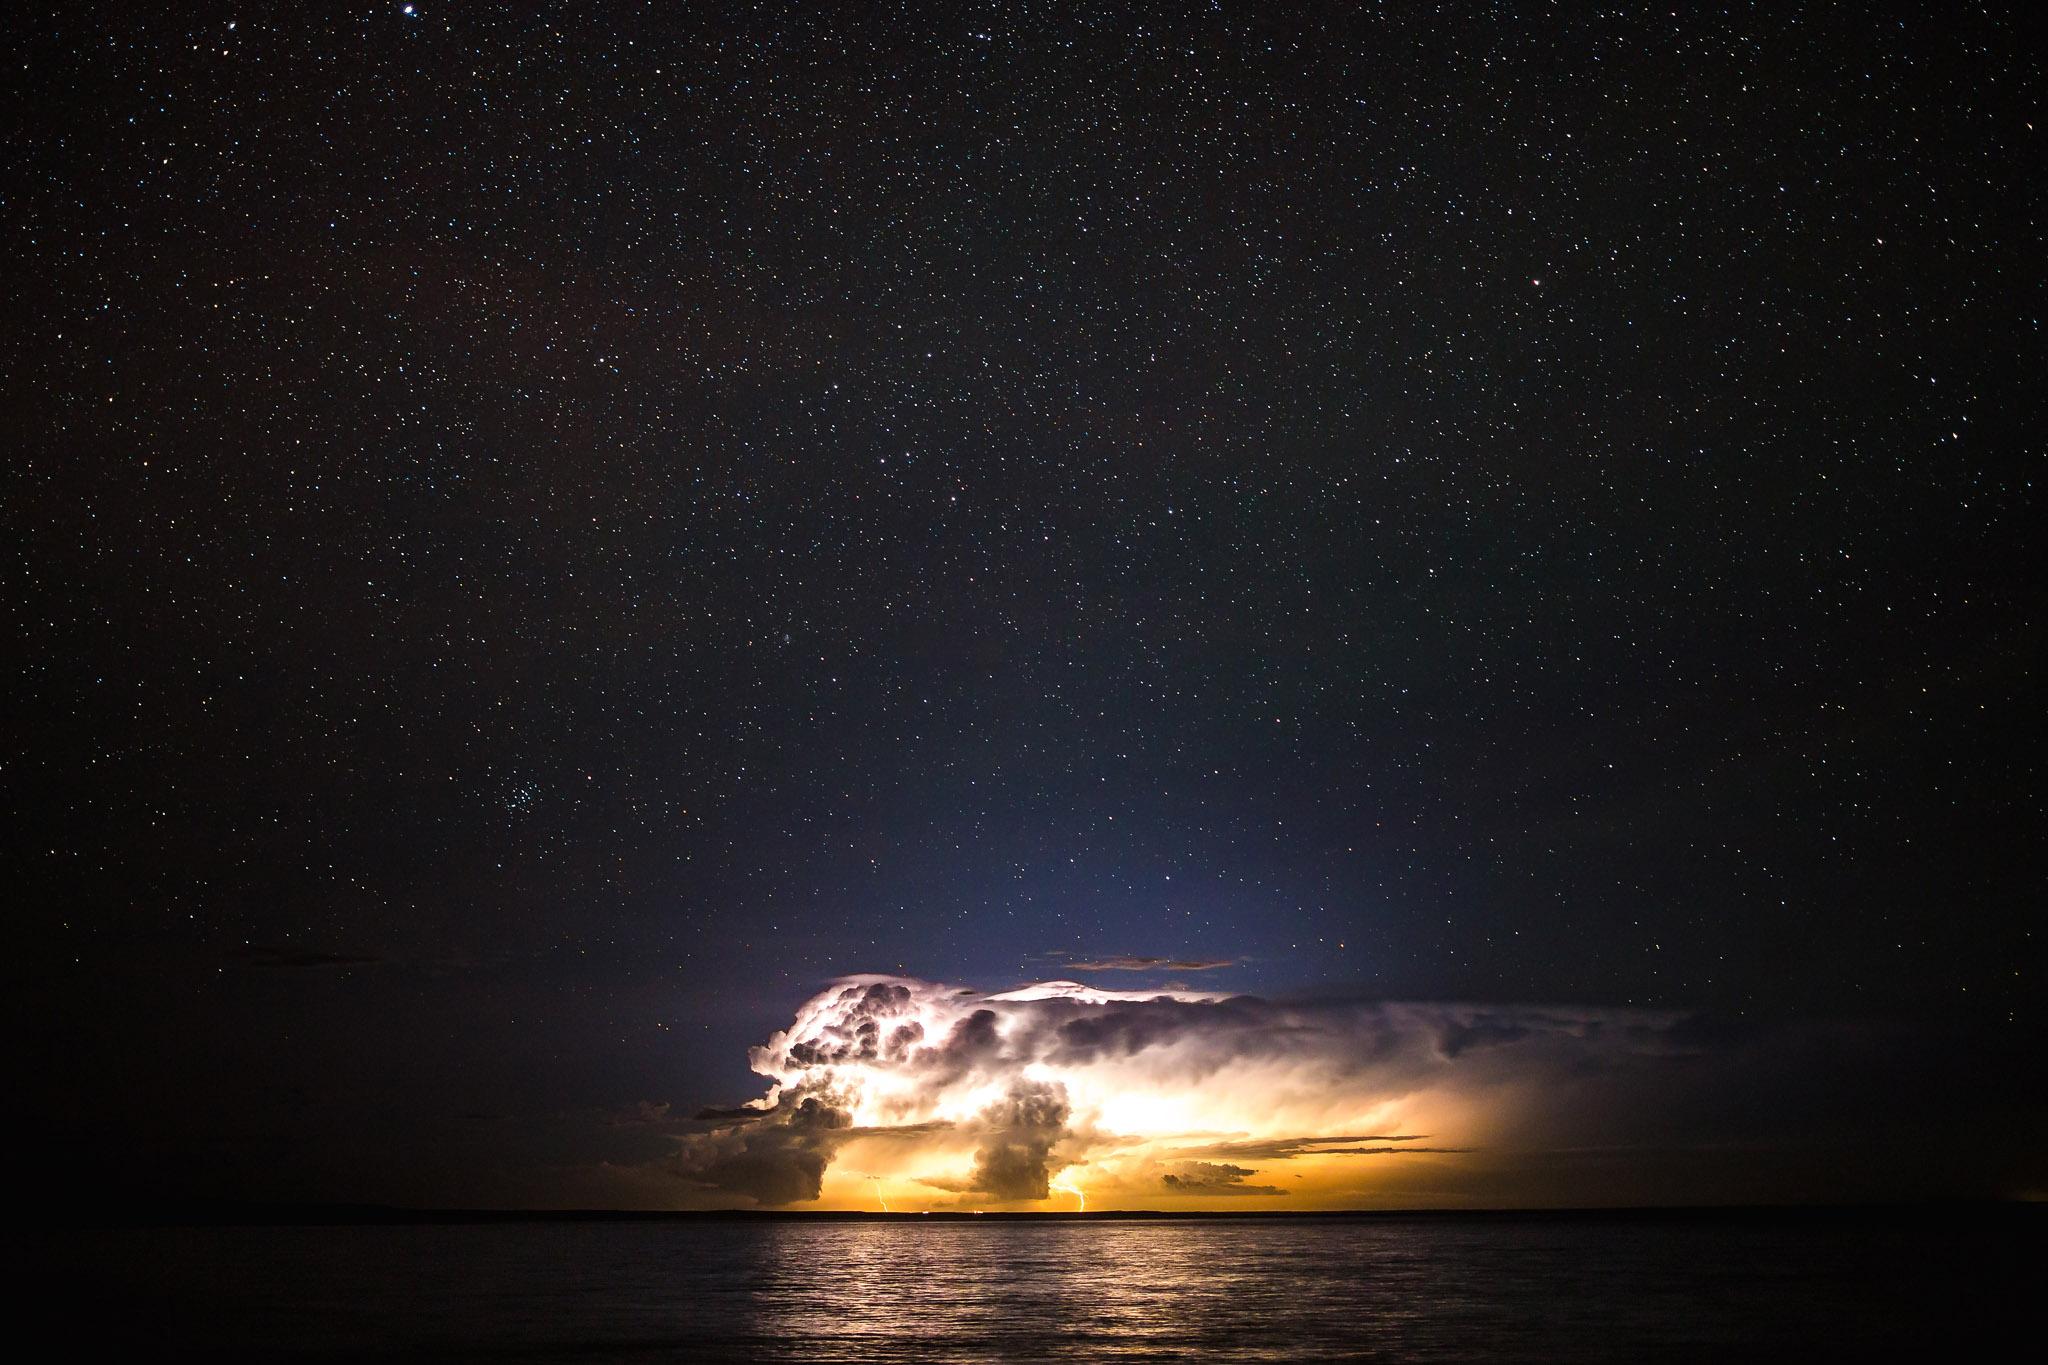 wedding-travellers-argentina-nigh-storm-lightning